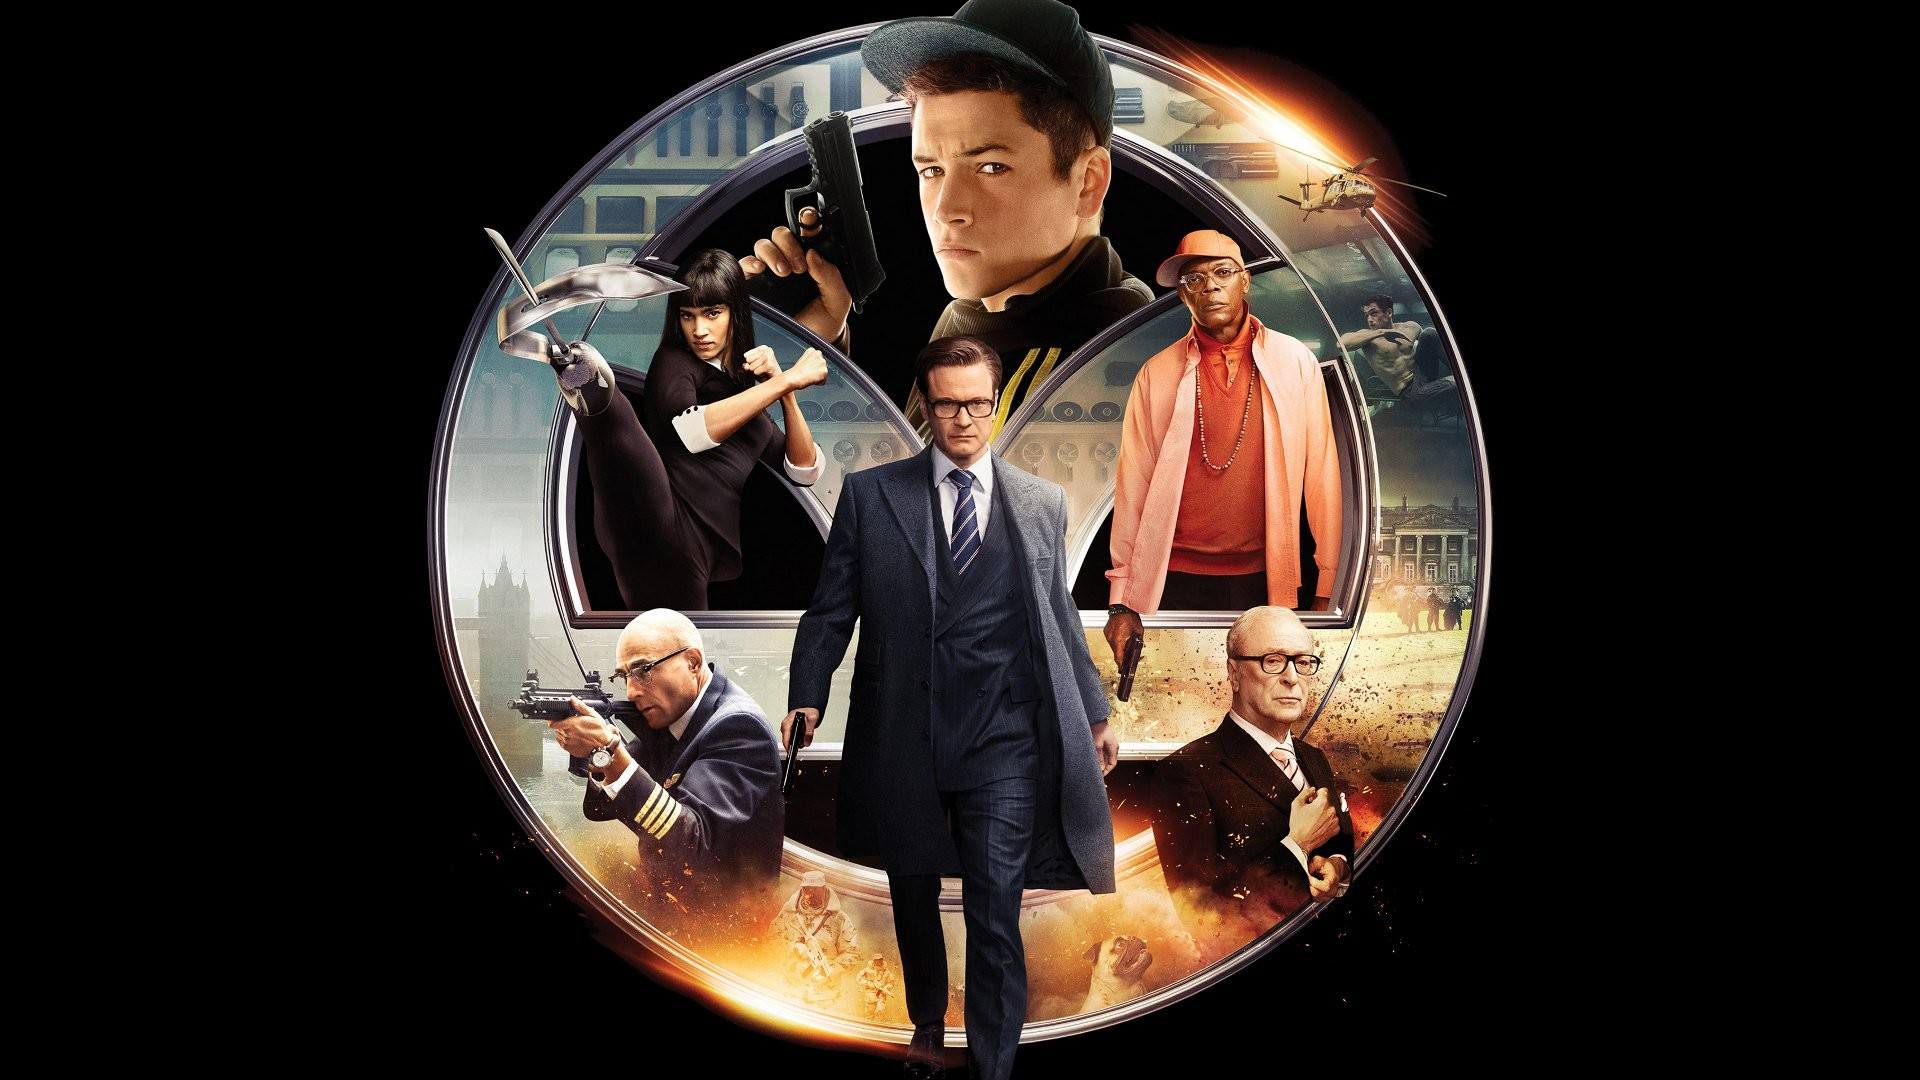 Res: 1920x1080, Filme - Kingsman: The Secret Service Sofia Boutella Mark Strong Michael  Caine Colin Firth Taron